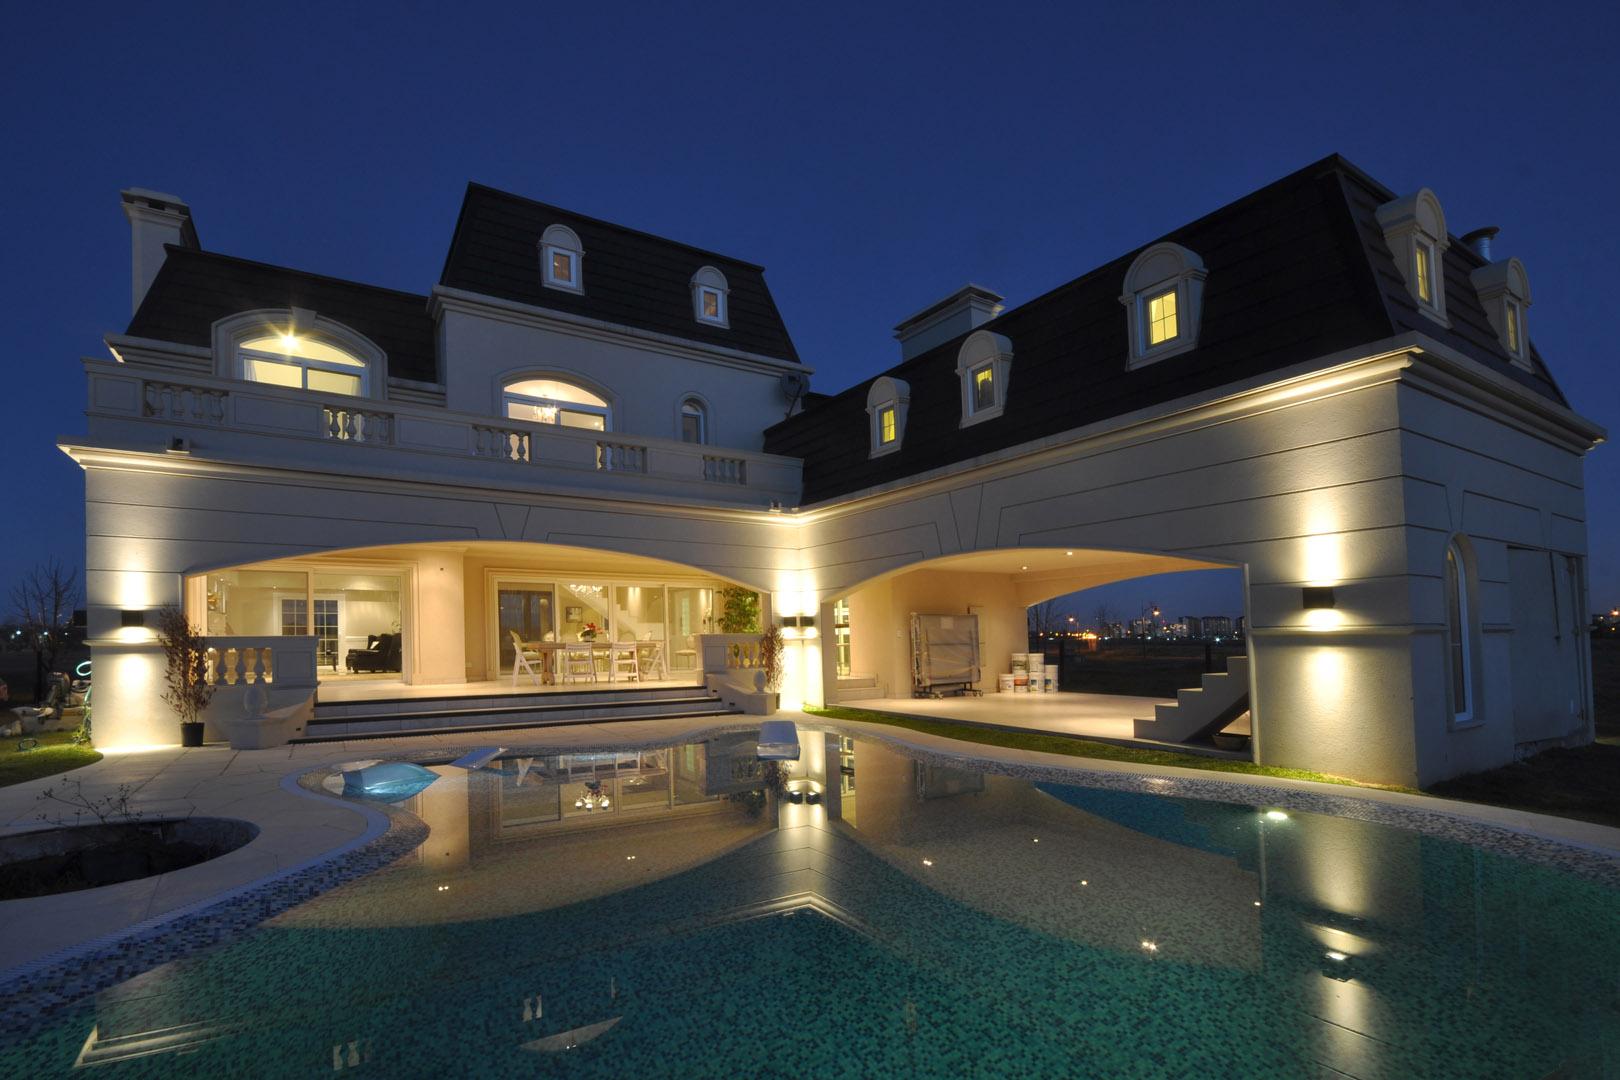 Estudio a r arquitectos casa mf francesa portal de - Estudio 3 arquitectos ...